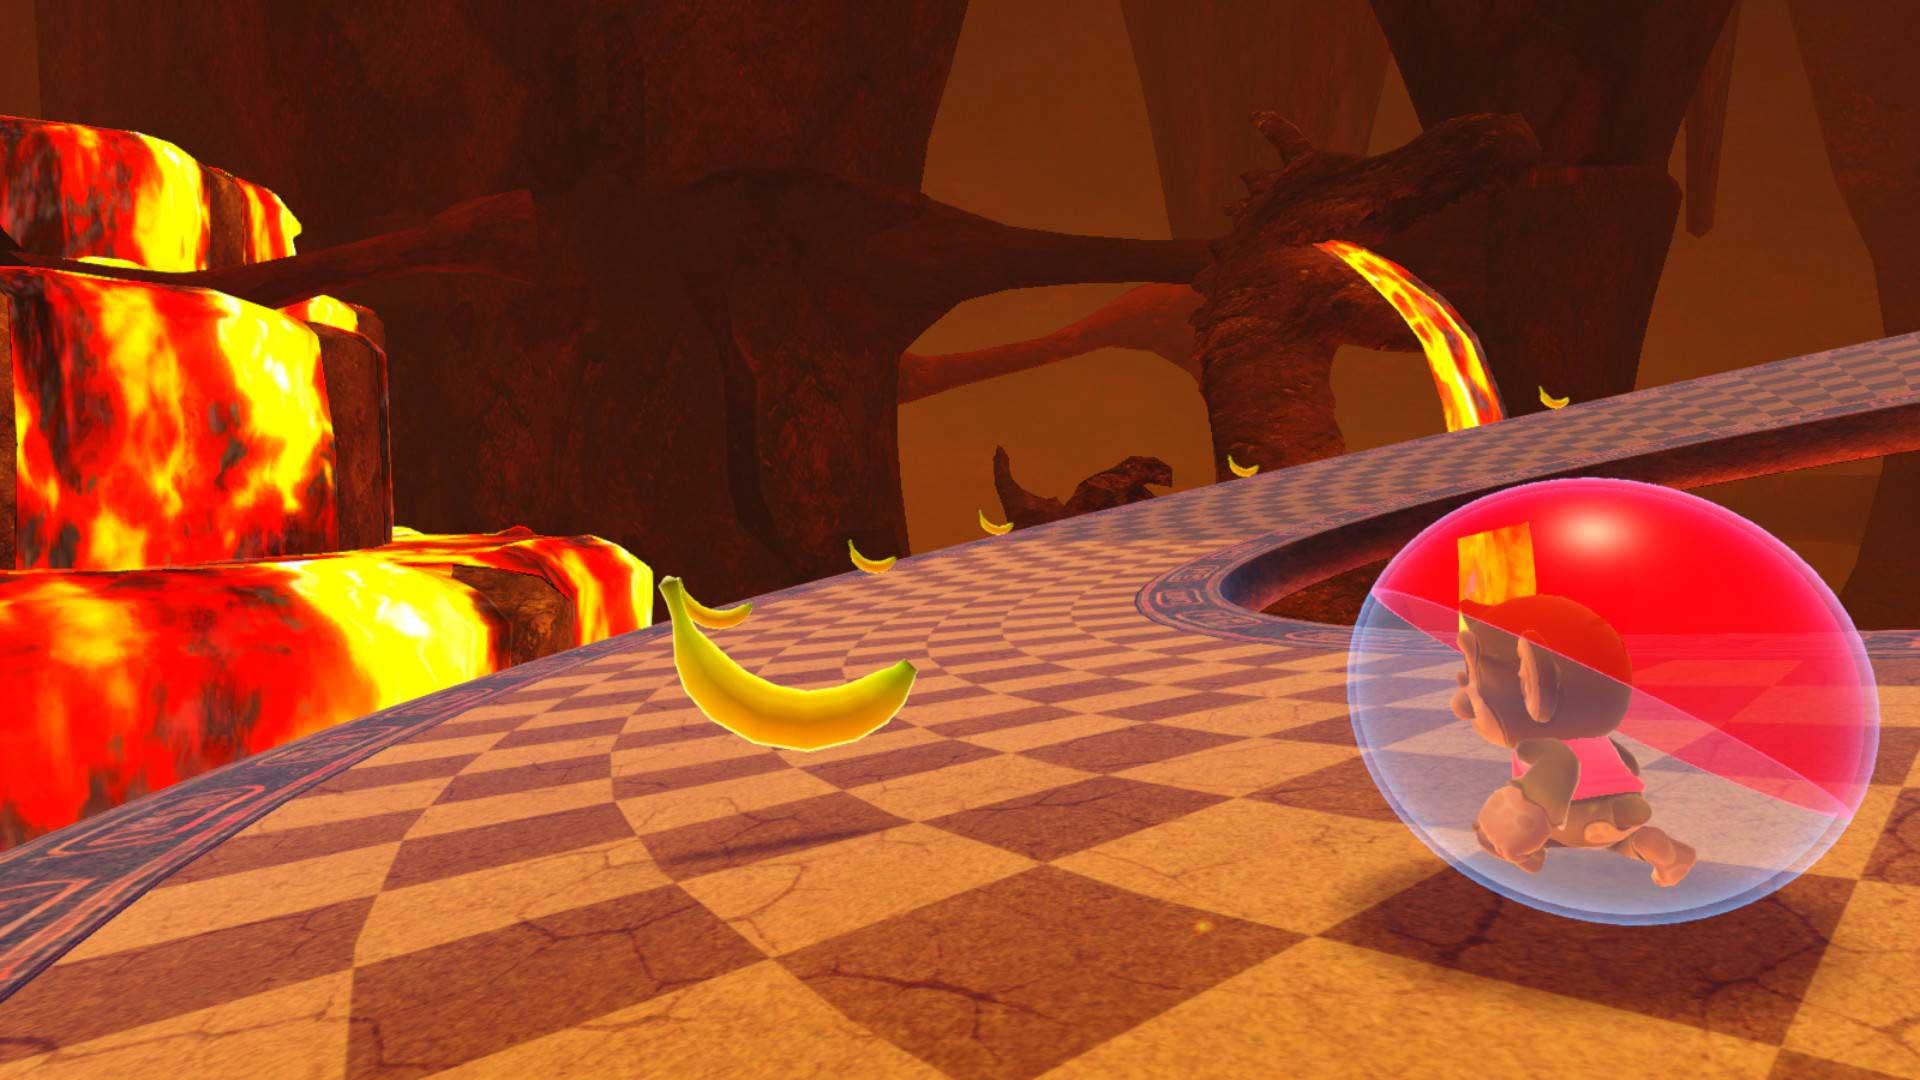 Super Monkey Ball Banana Mania: AiAi rollt wieder